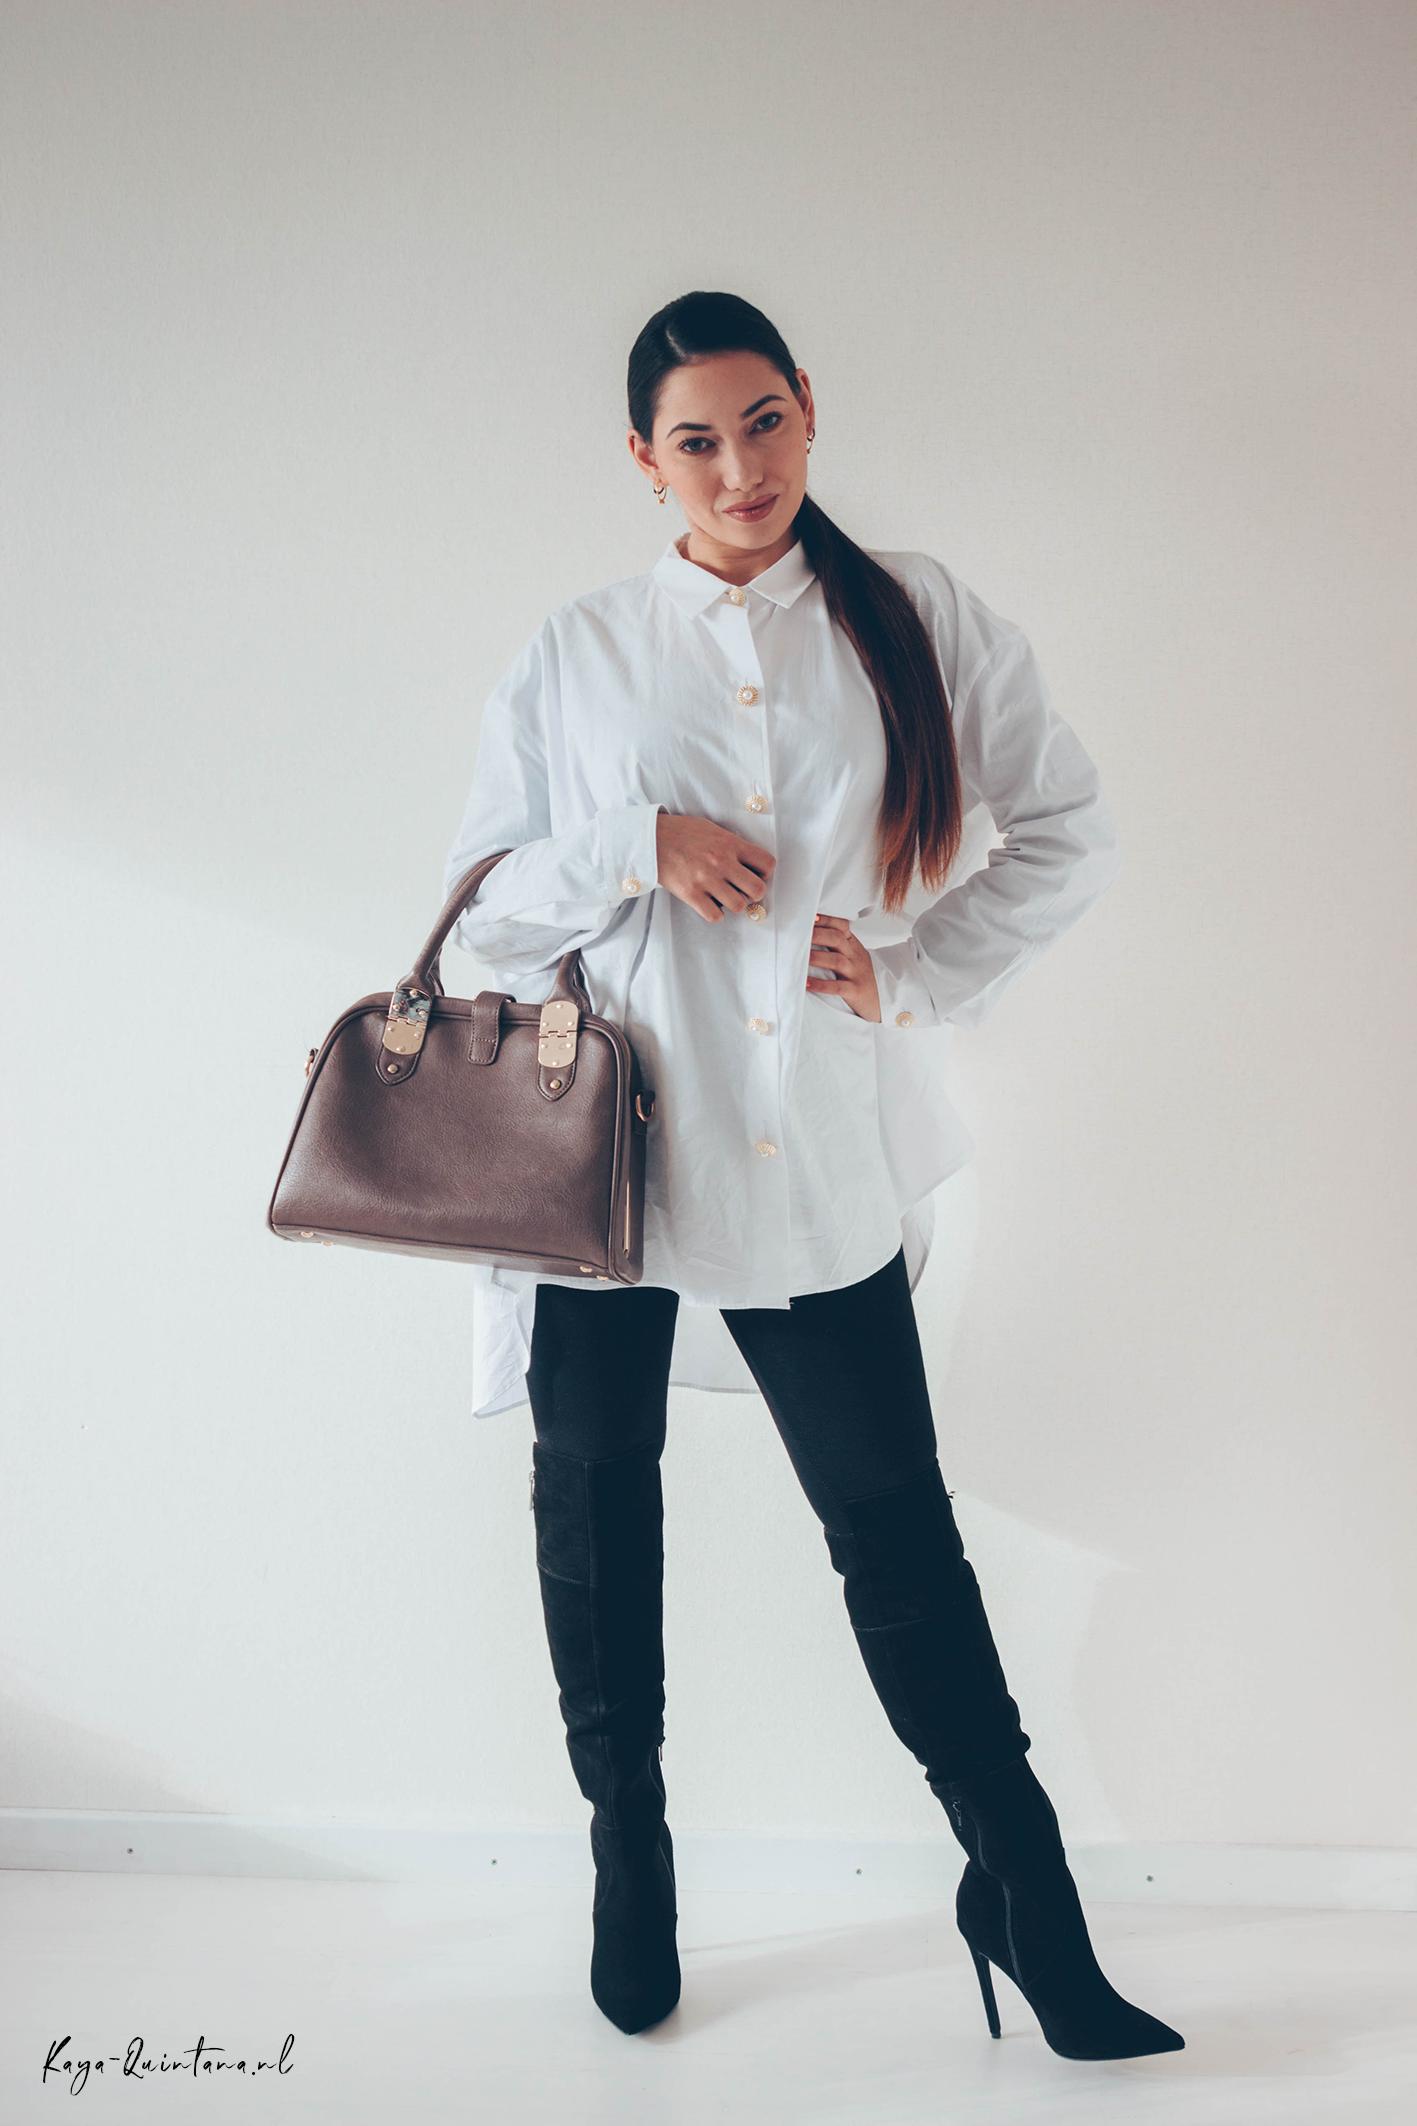 dune handbag outfit